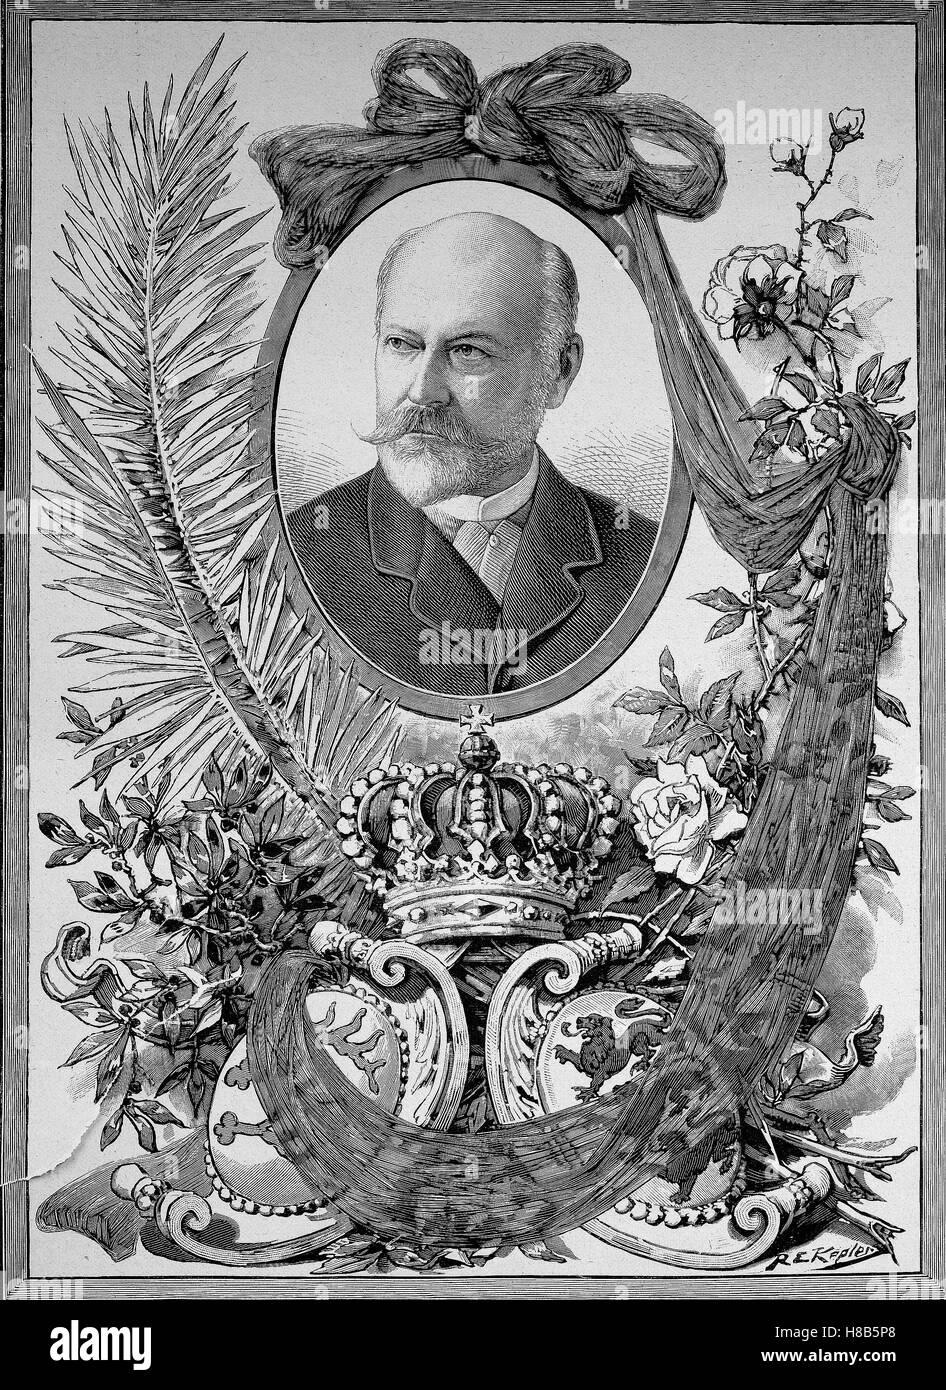 Charles, Karl Friedrich Alexander, Koenig von Wuerttemberg; 6 March 1823 - 6 October 1891, was King of Wuerttemberg, - Stock Image